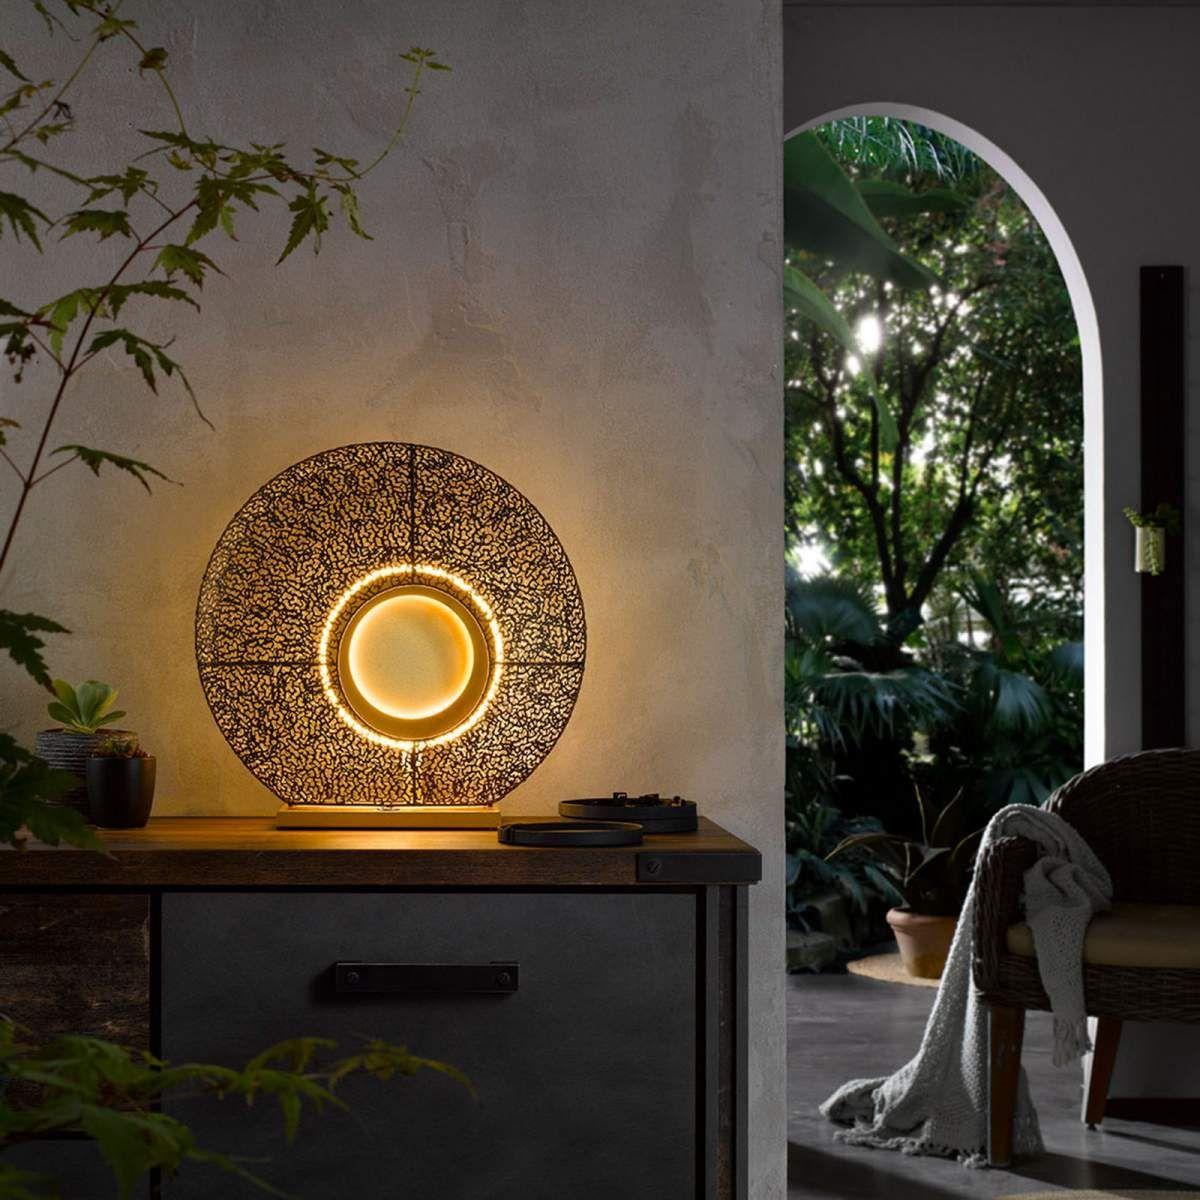 Led Tischleuchte Mina Mit Metallschirm In Rost Ledtischleuchte Metallschirm Mina Mit Rost In 2020 Led Table Lamp Lamp Table Lamp